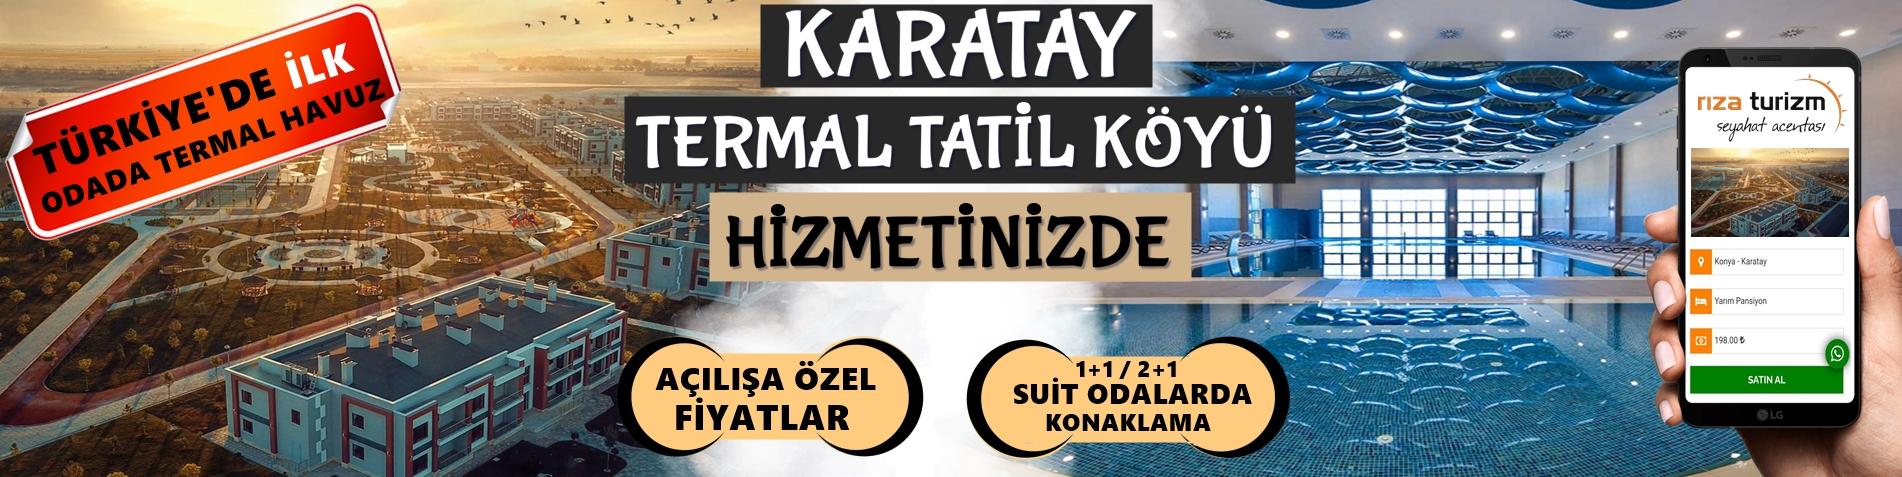 karatay thermal